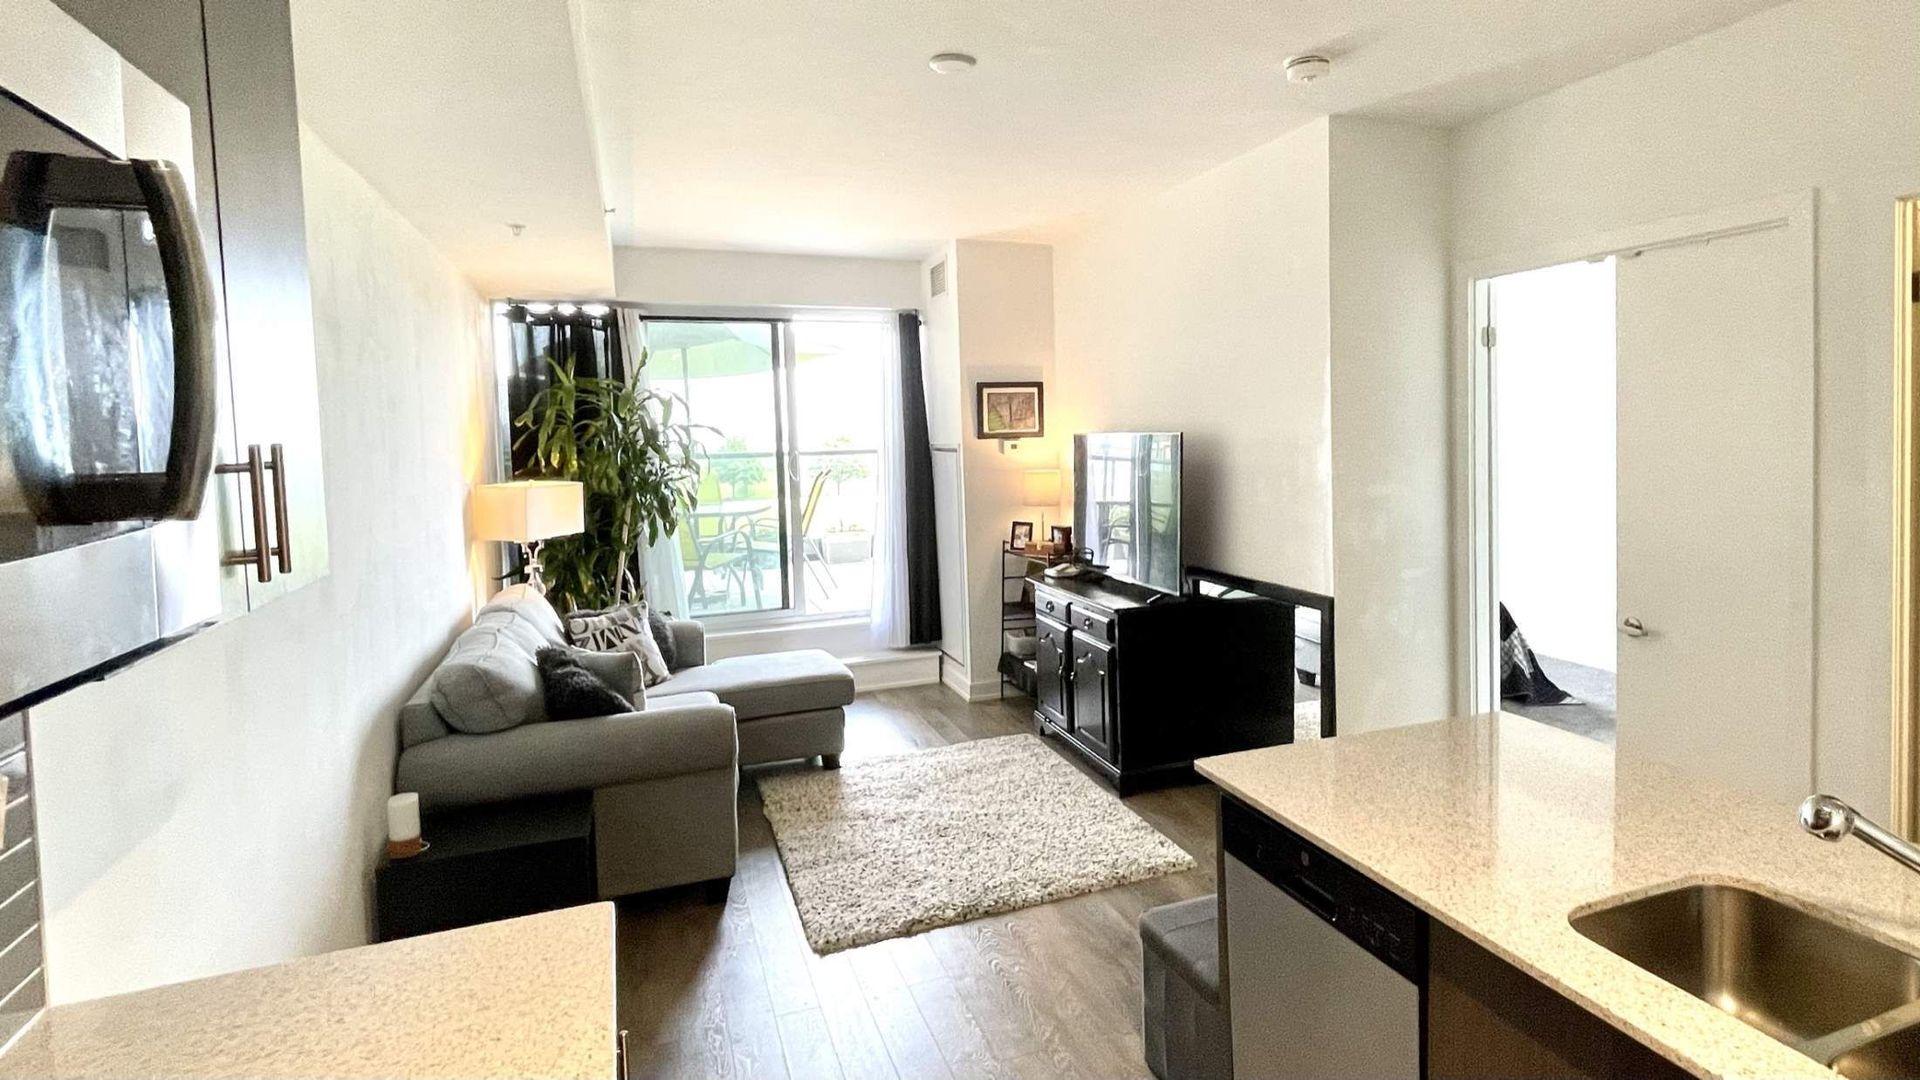 livingroom4 at # 215 - 550 North Service Road, Grimsby